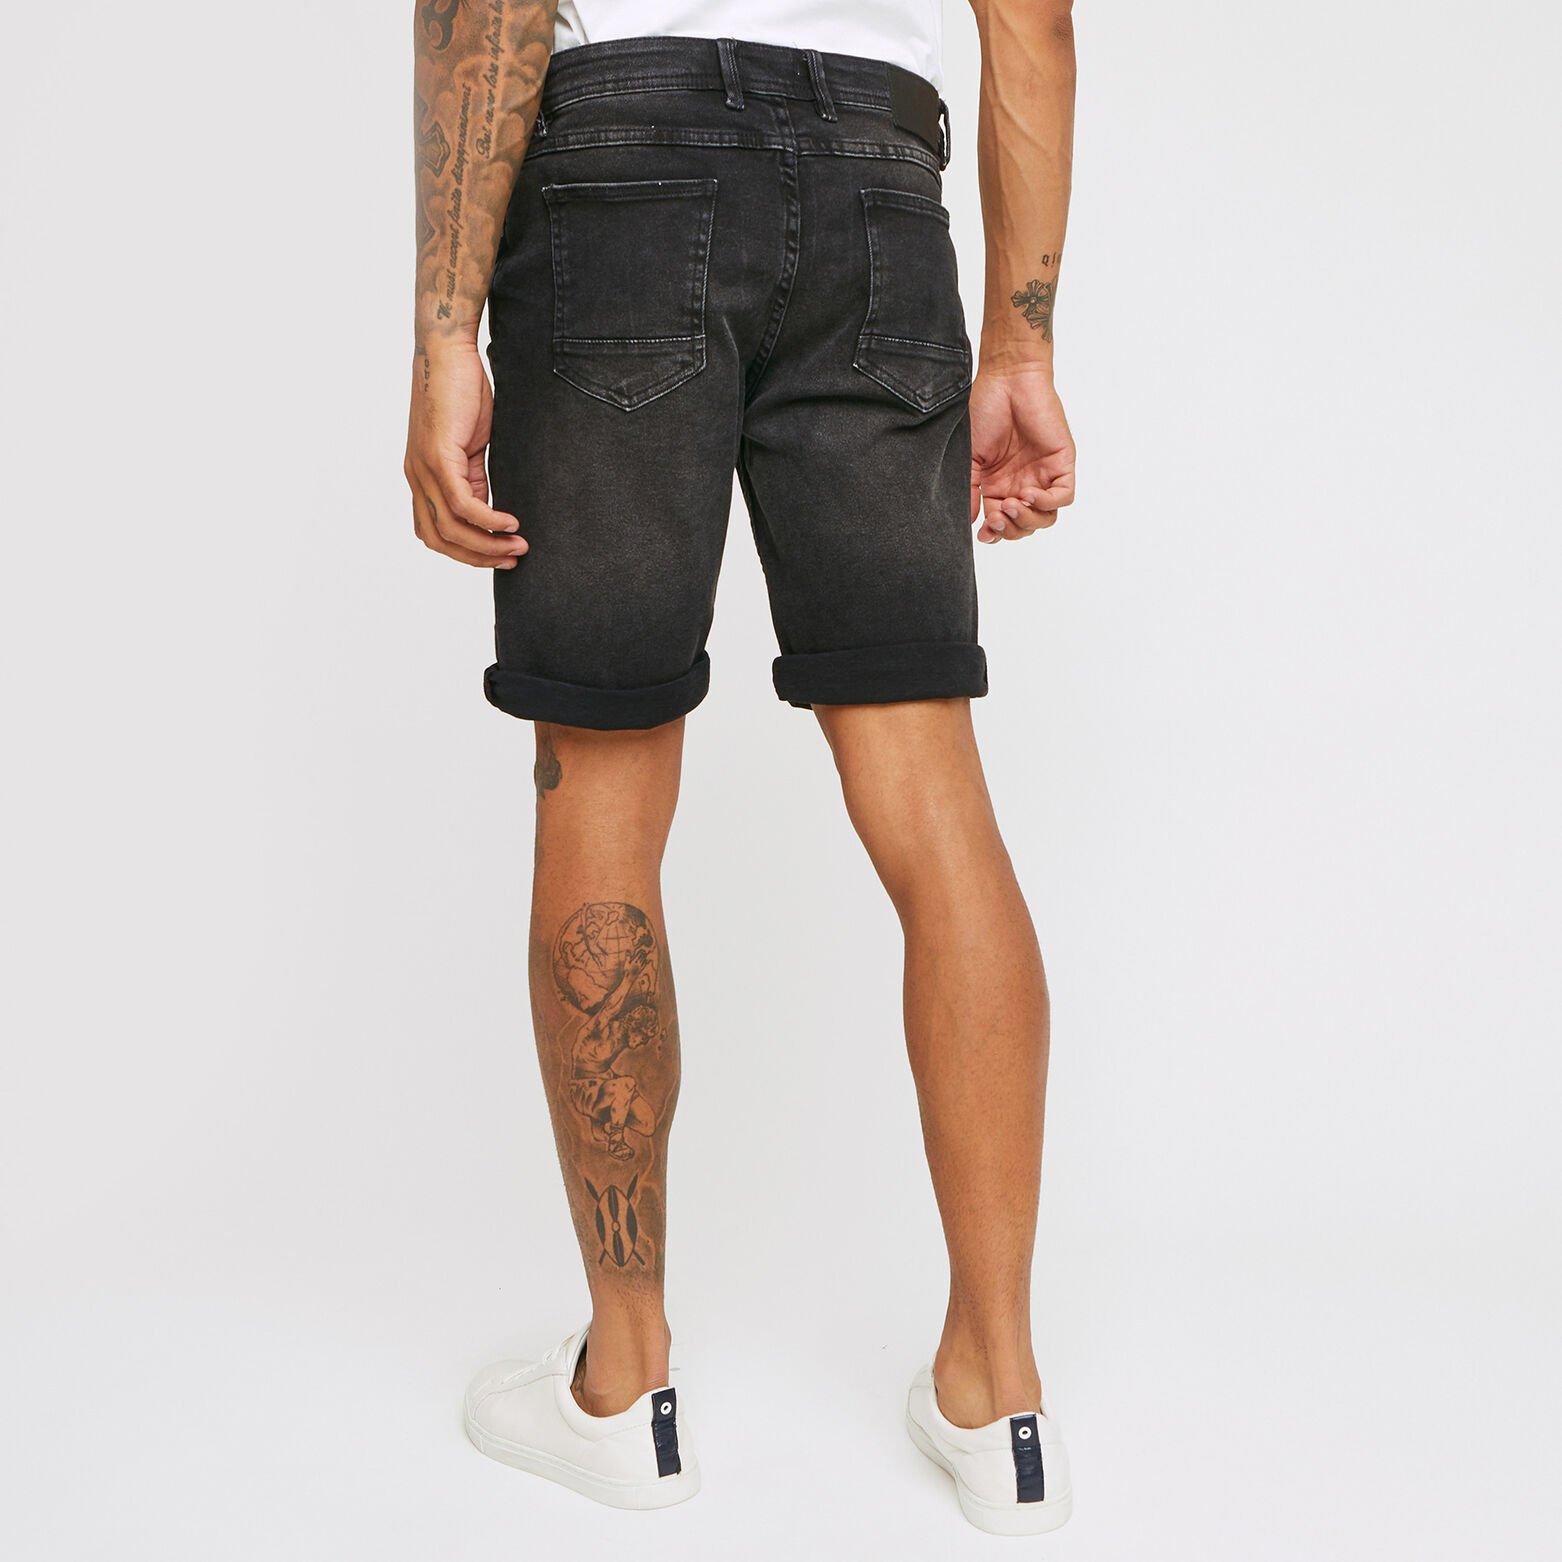 Bermuda 5 poches denim noir lavé